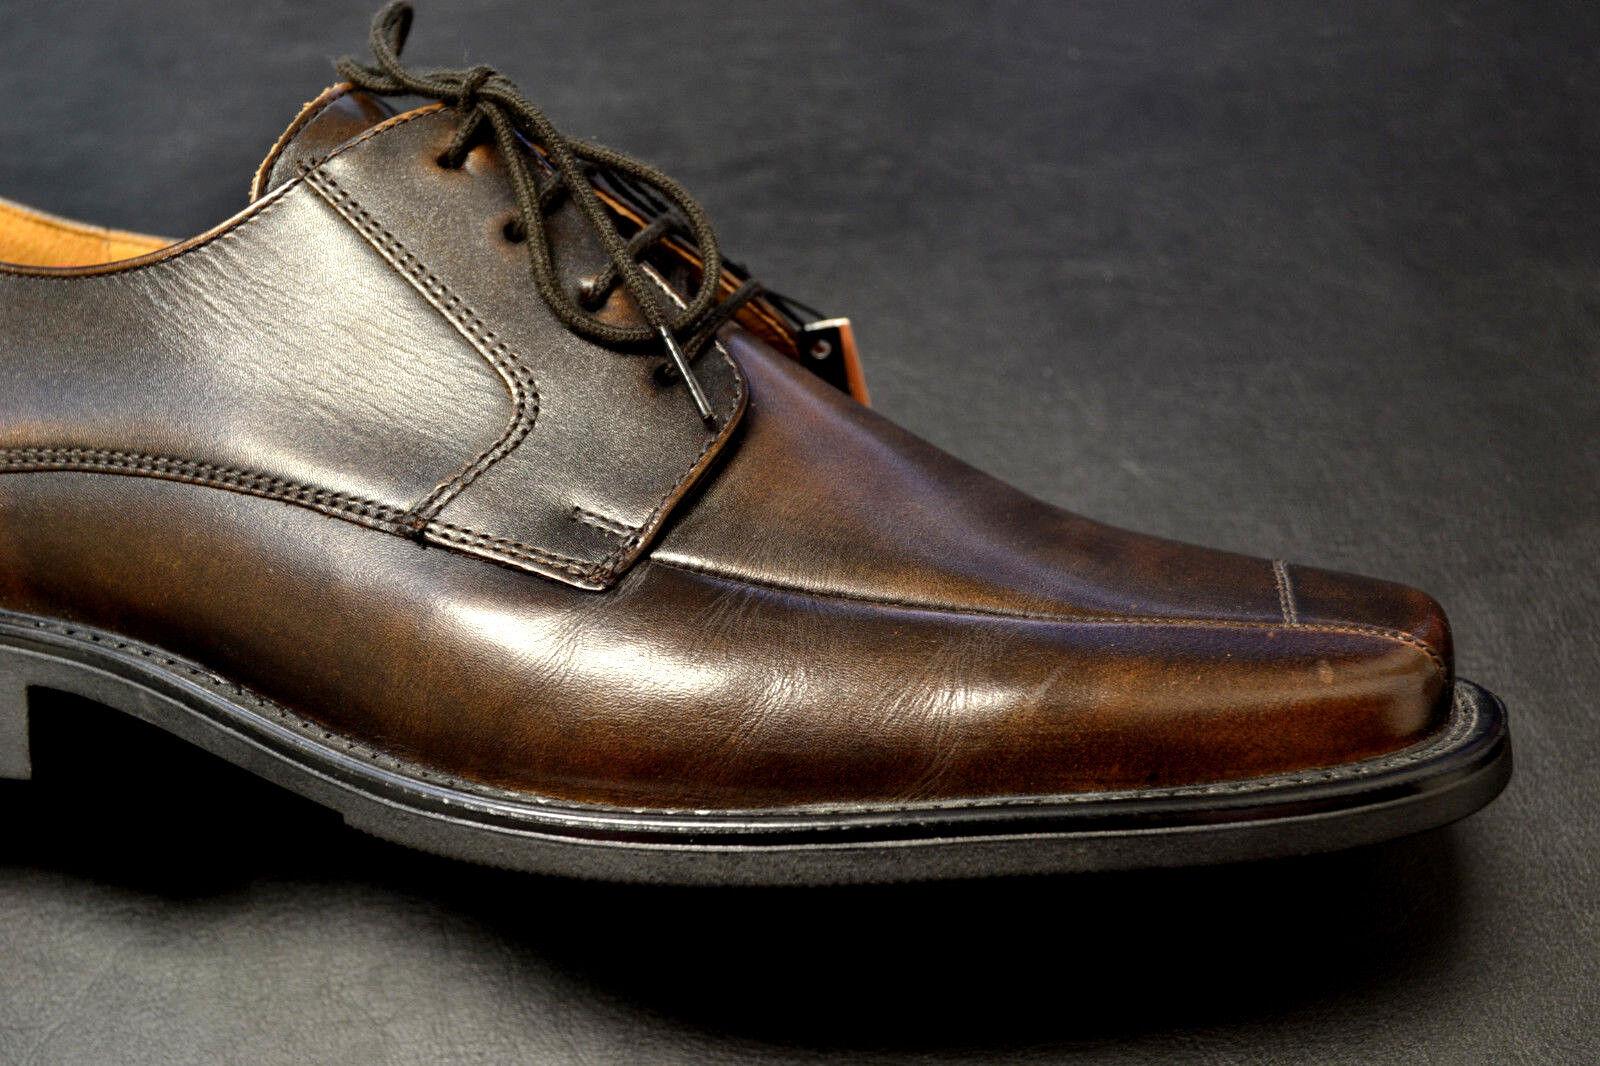 Lloyd Shoes Kelly Cigar MARRON Chaussures E Hommes Busineschaussures  Nouveau R E Chaussures D U Z I E R T 506a06